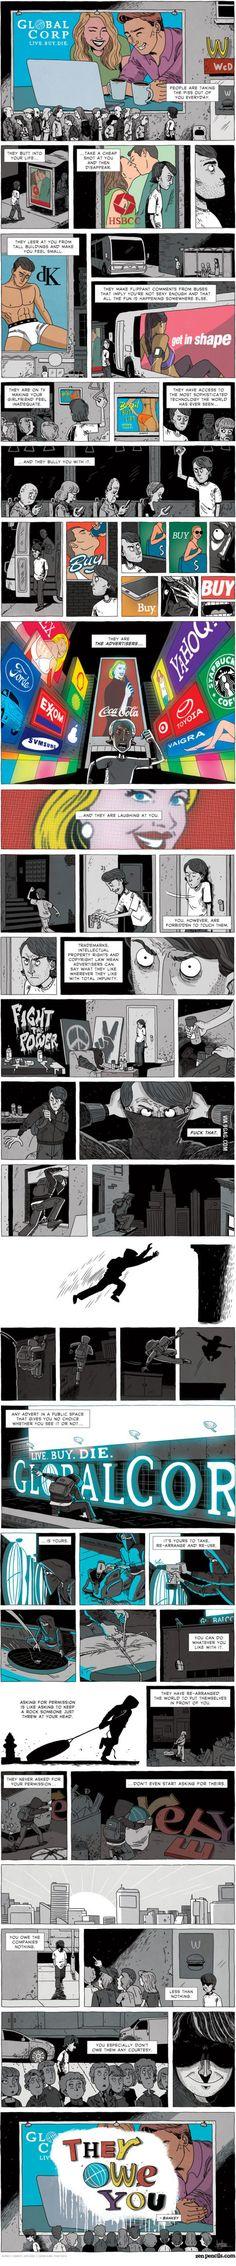 New Bansky comics